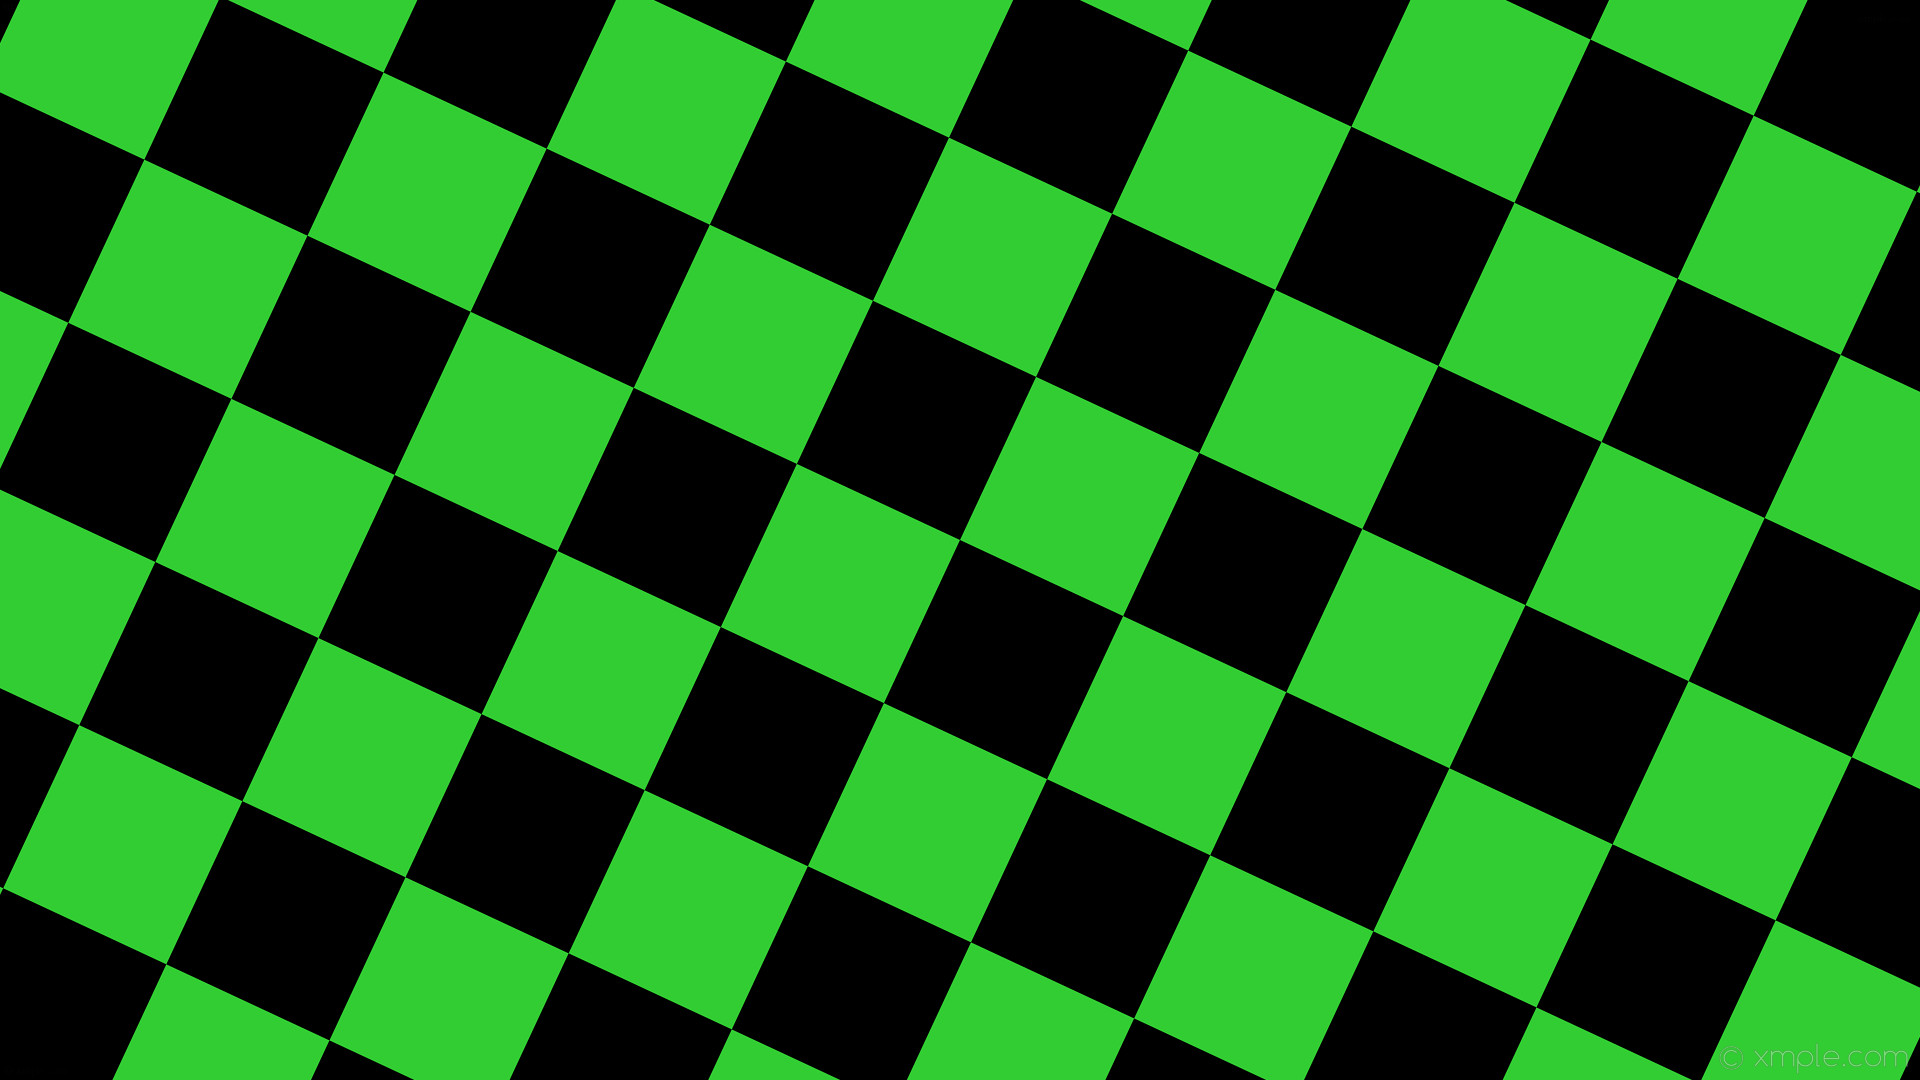 wallpaper black squares green checkered lime green #32cd32 #000000 diagonal  65° 180px